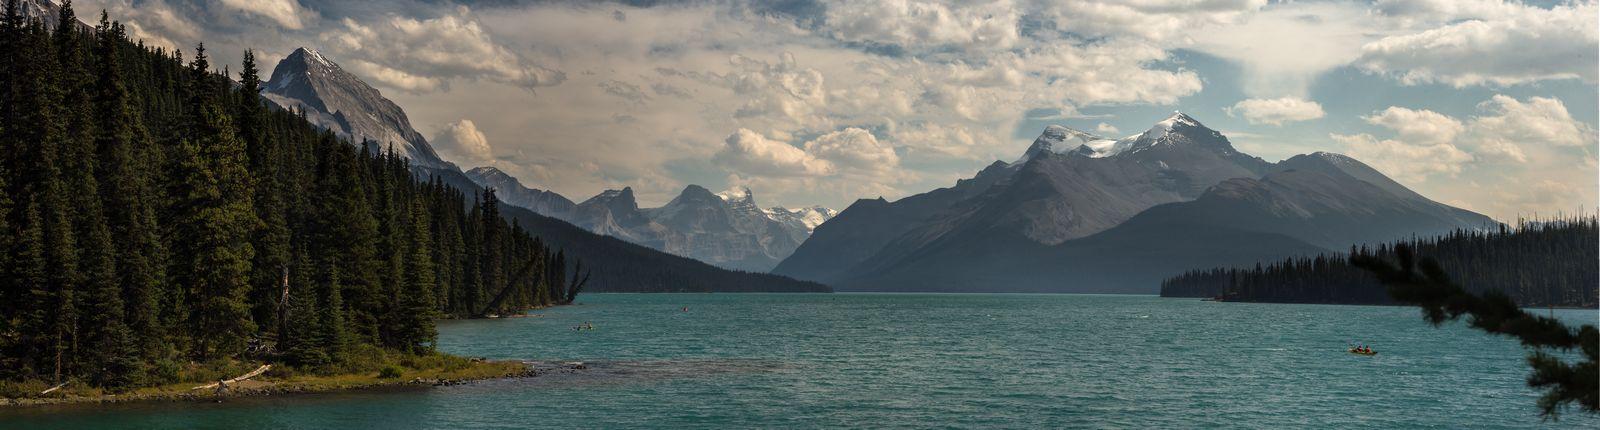 Maligne Lake panorámico